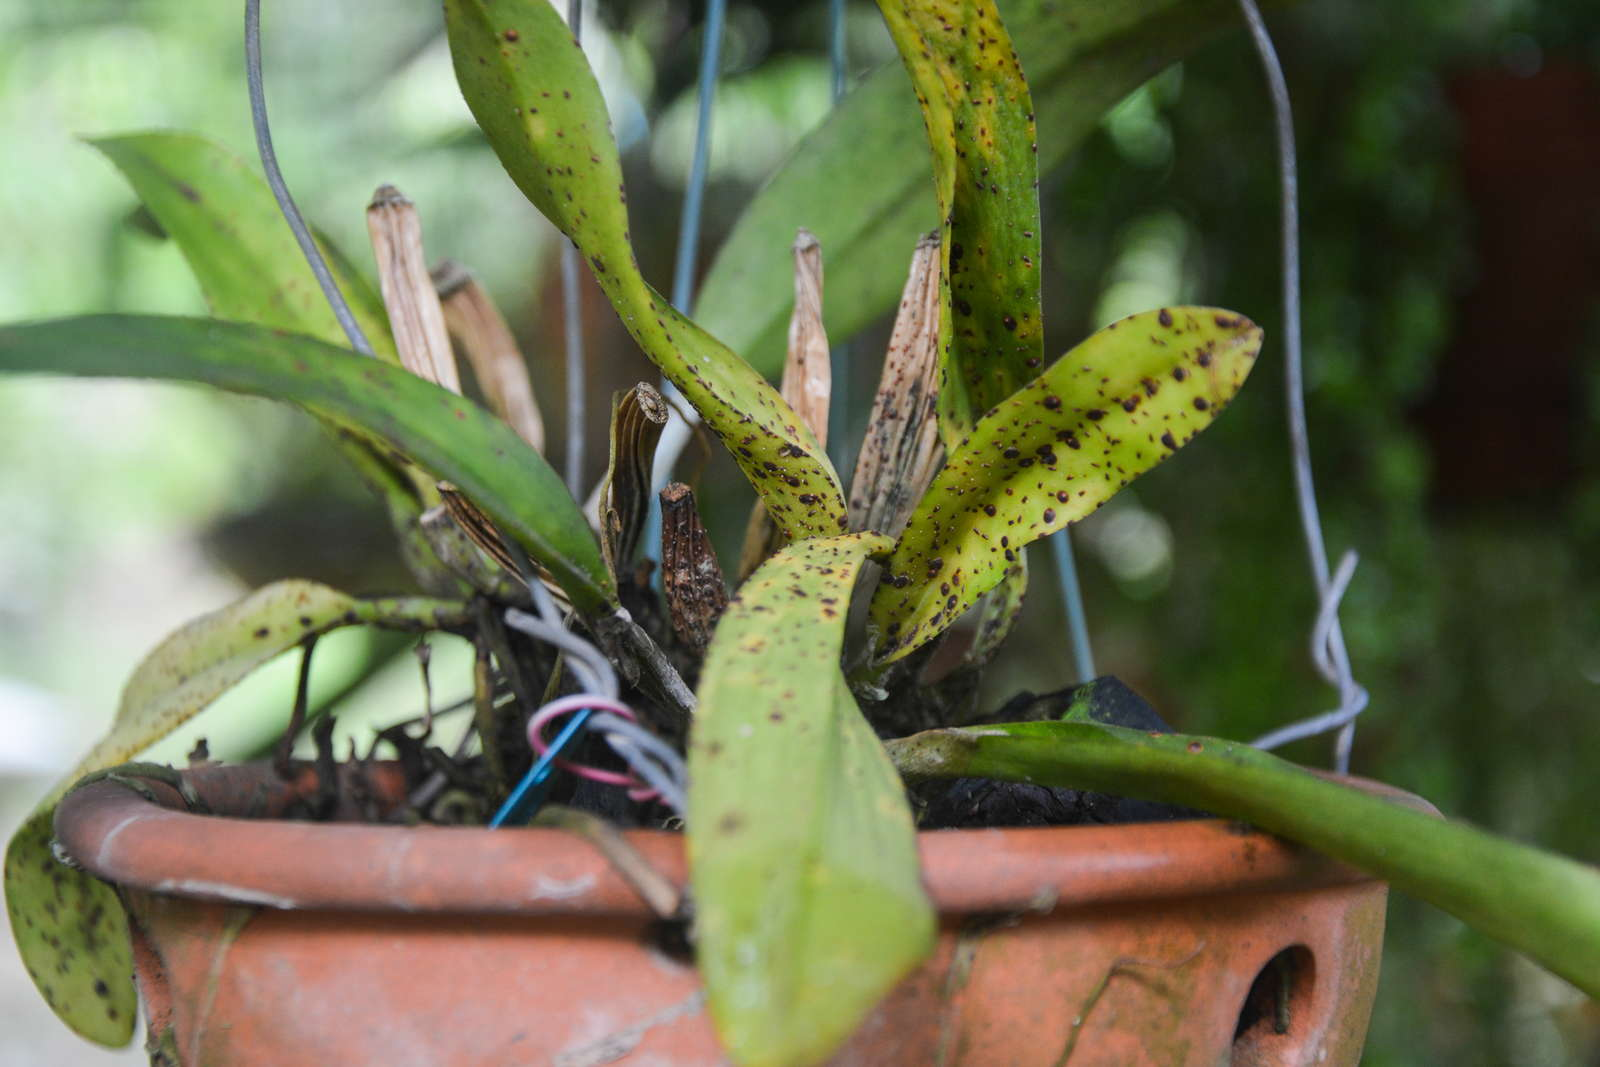 orchideen krankheiten sch dlinge bek mpfen profi tipps. Black Bedroom Furniture Sets. Home Design Ideas